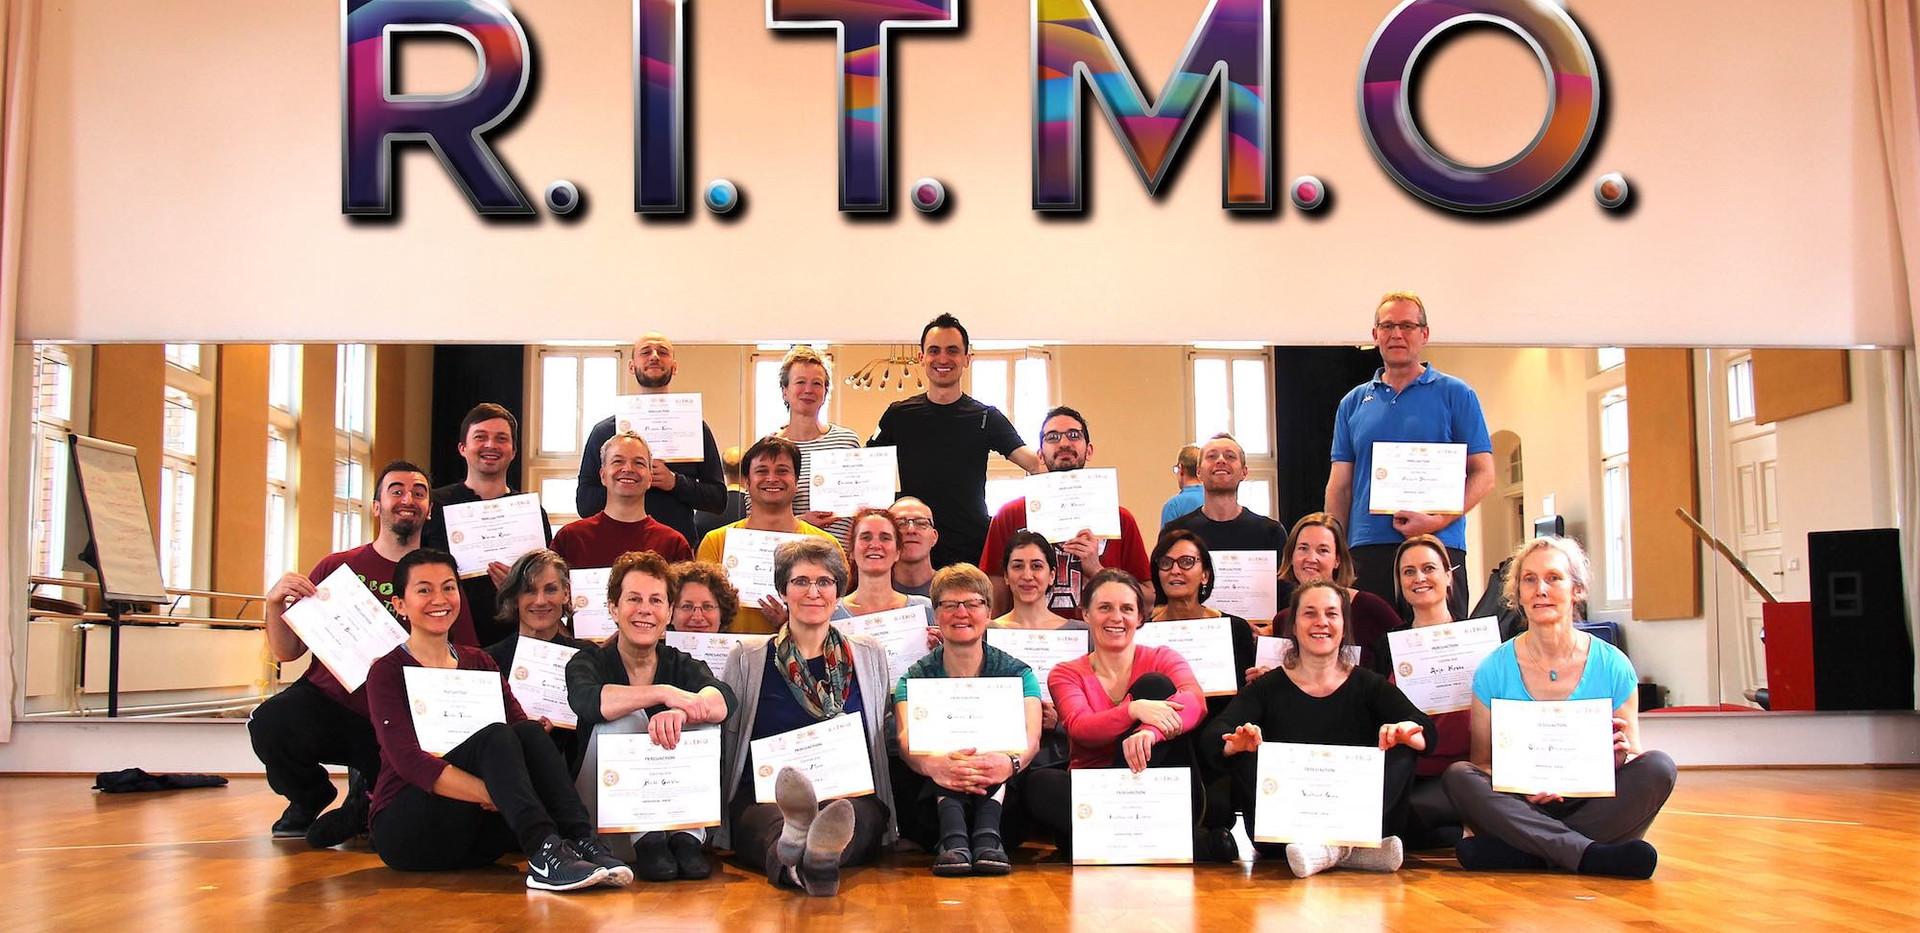 R.I.T.M.O. Group 1.jpg